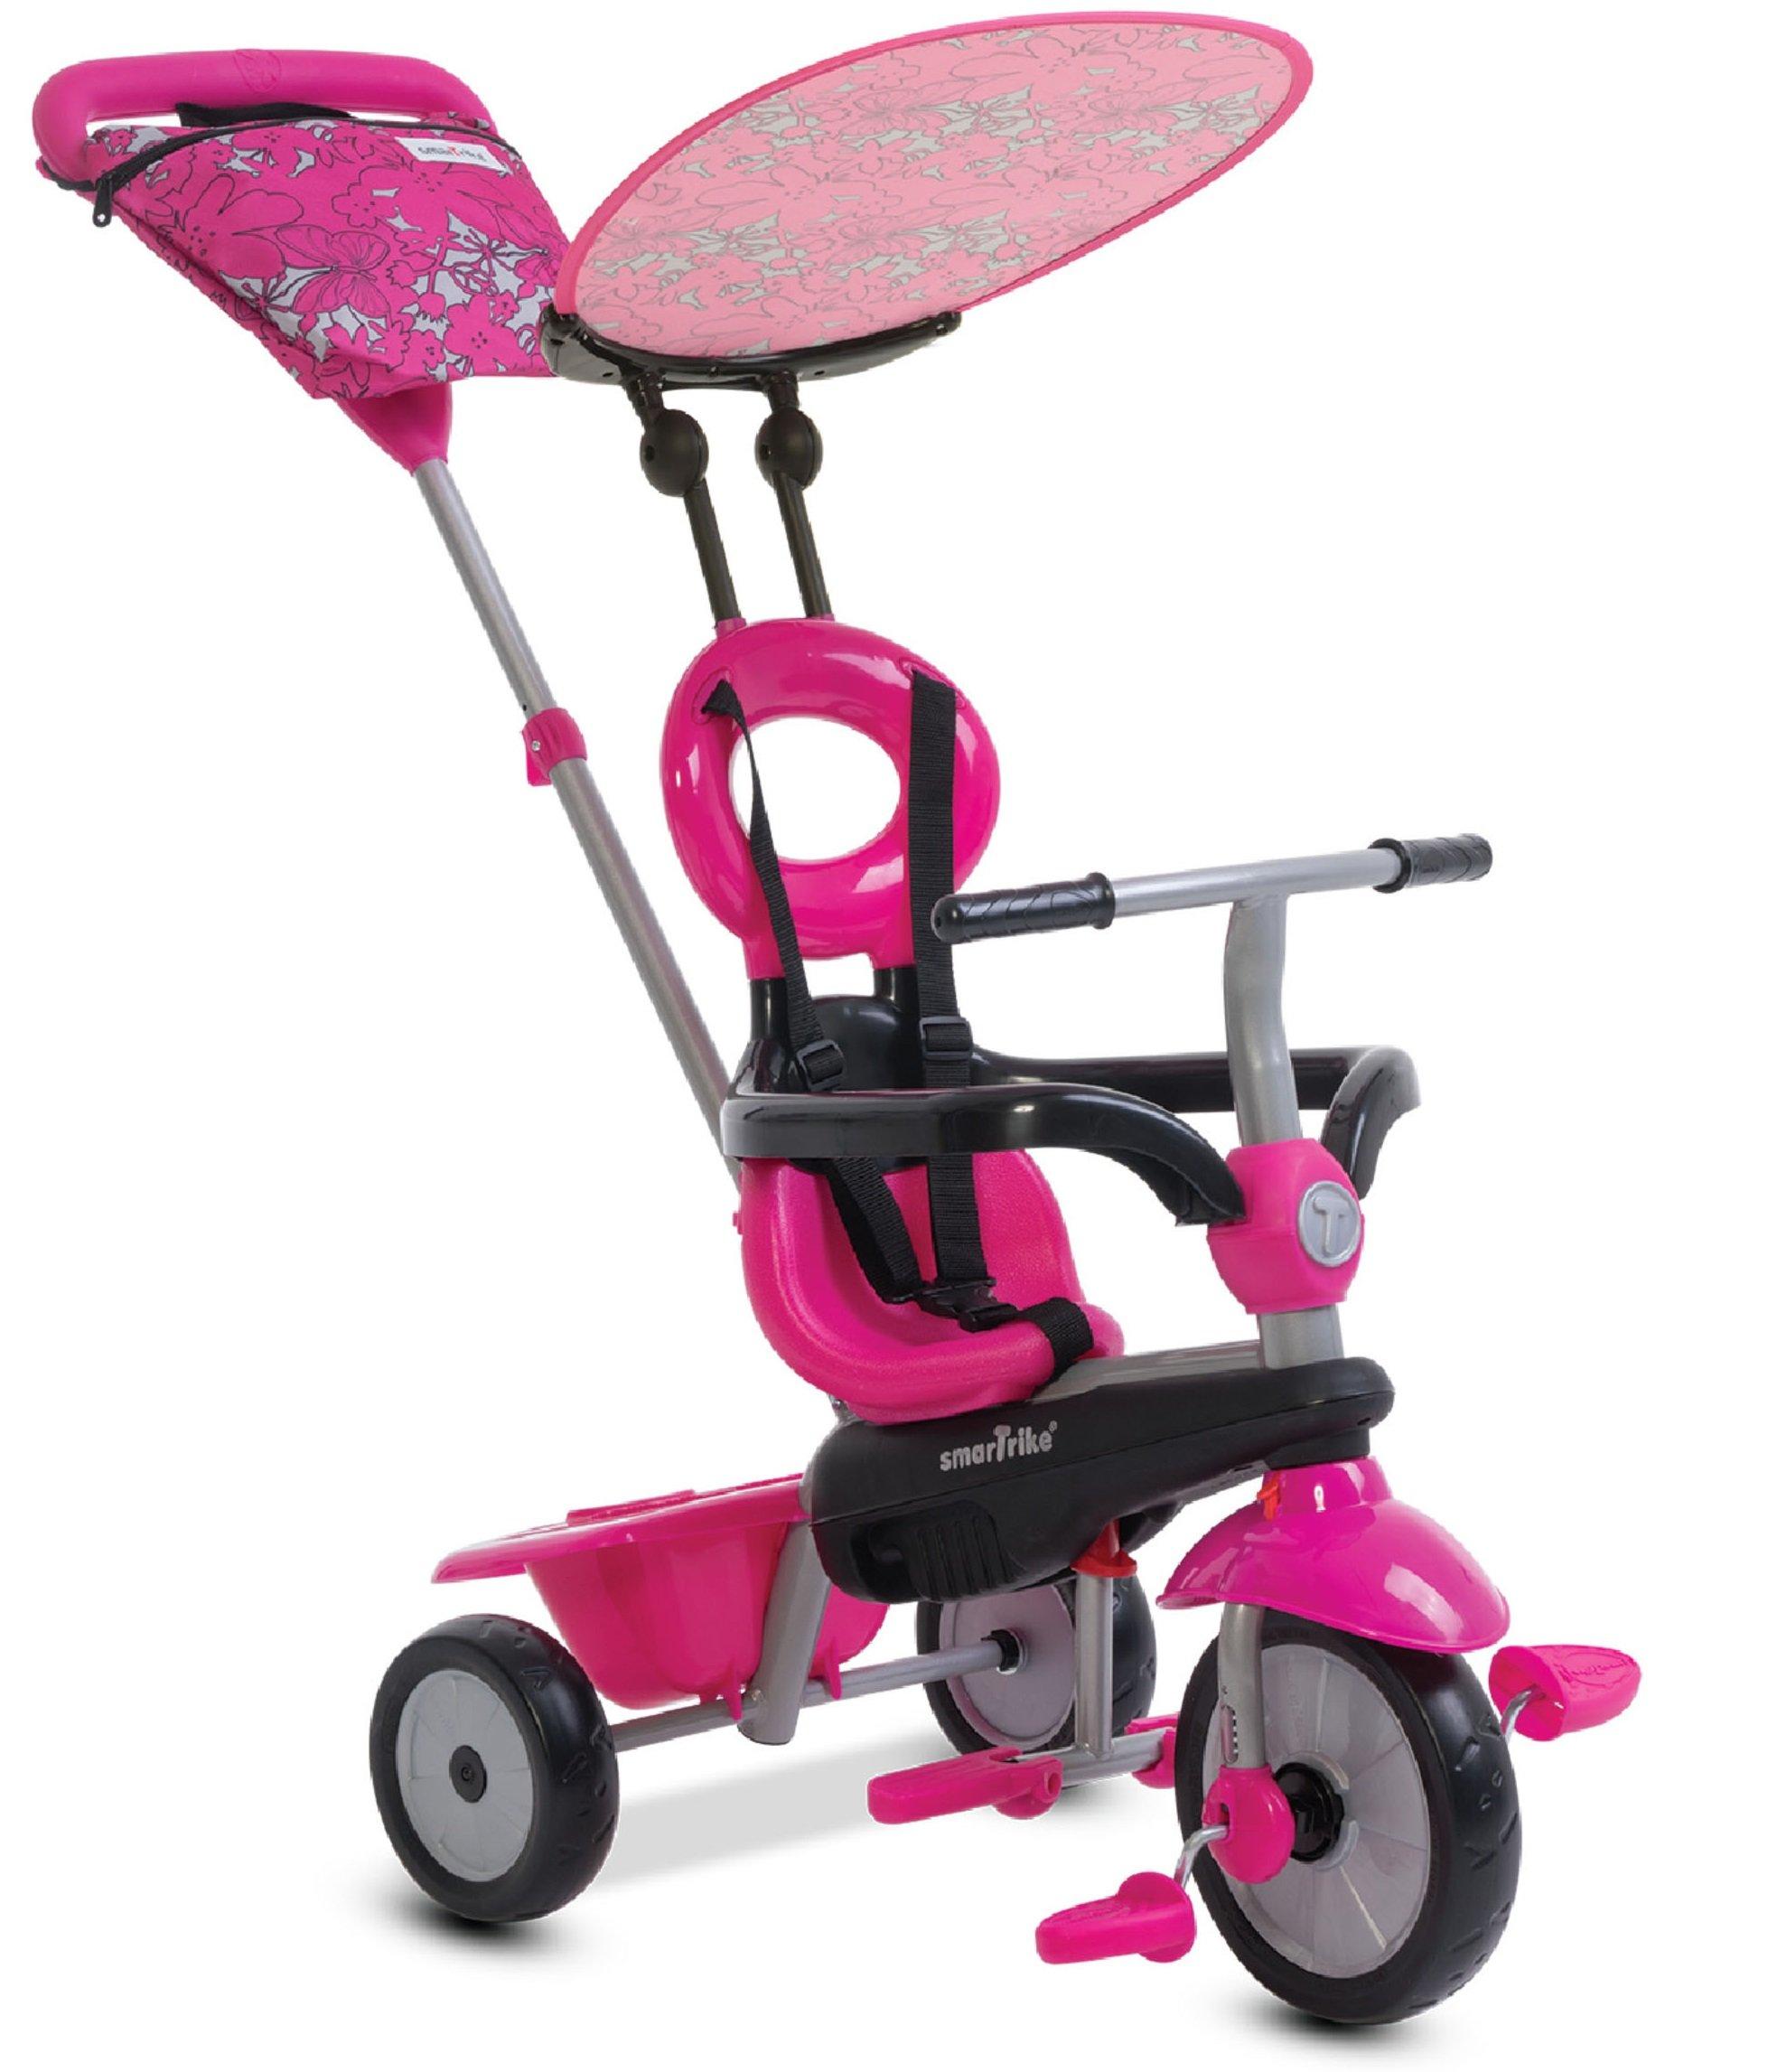 smarTrike Vanilla Baby Tricycle, Pink by smarTrike